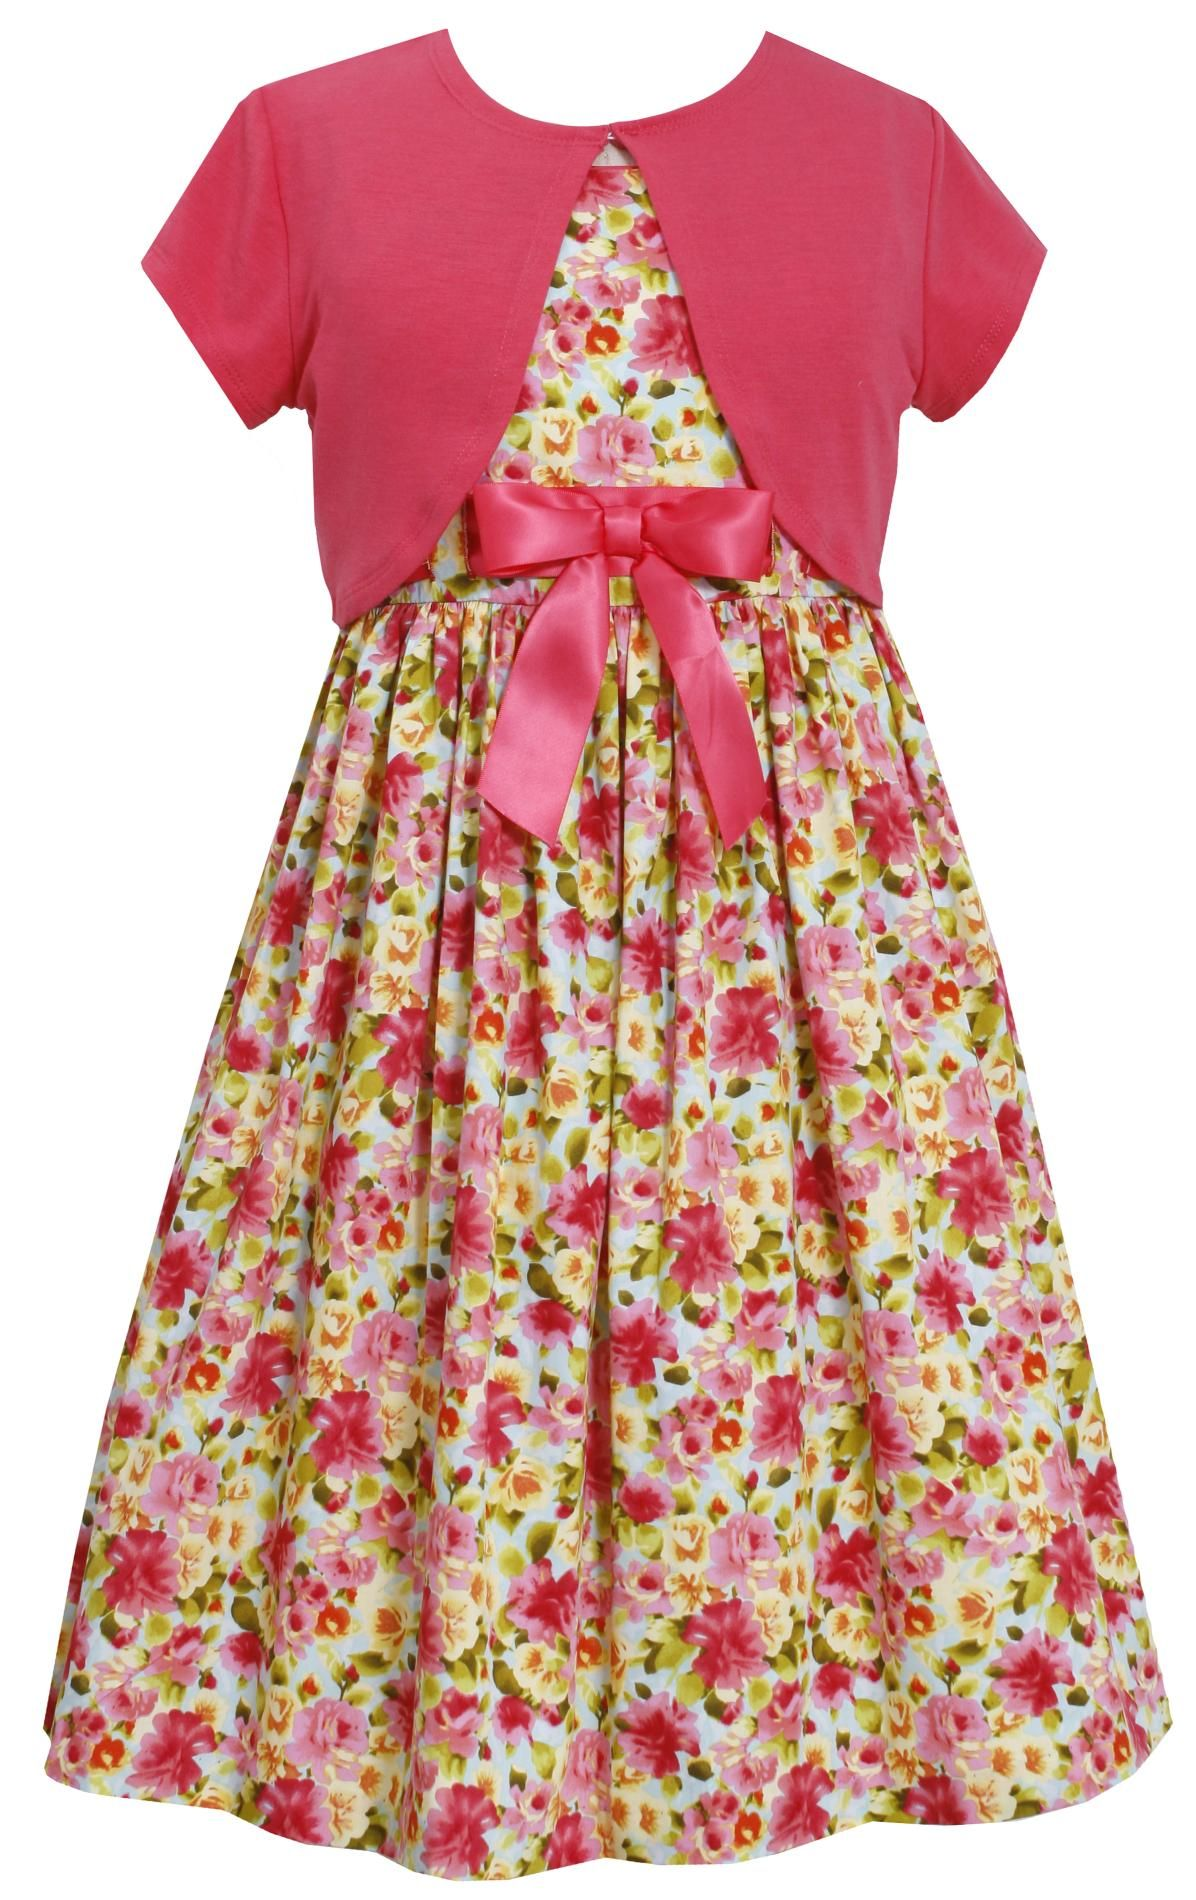 2bd819b2ec98 Ashley Ann Girl's Dress & Short-Sleeve Shrug - Floral - Kids - Kids'  Clothing - Girls' Clothing - Girls' Dresses SEARS ---Very Hobbit like!